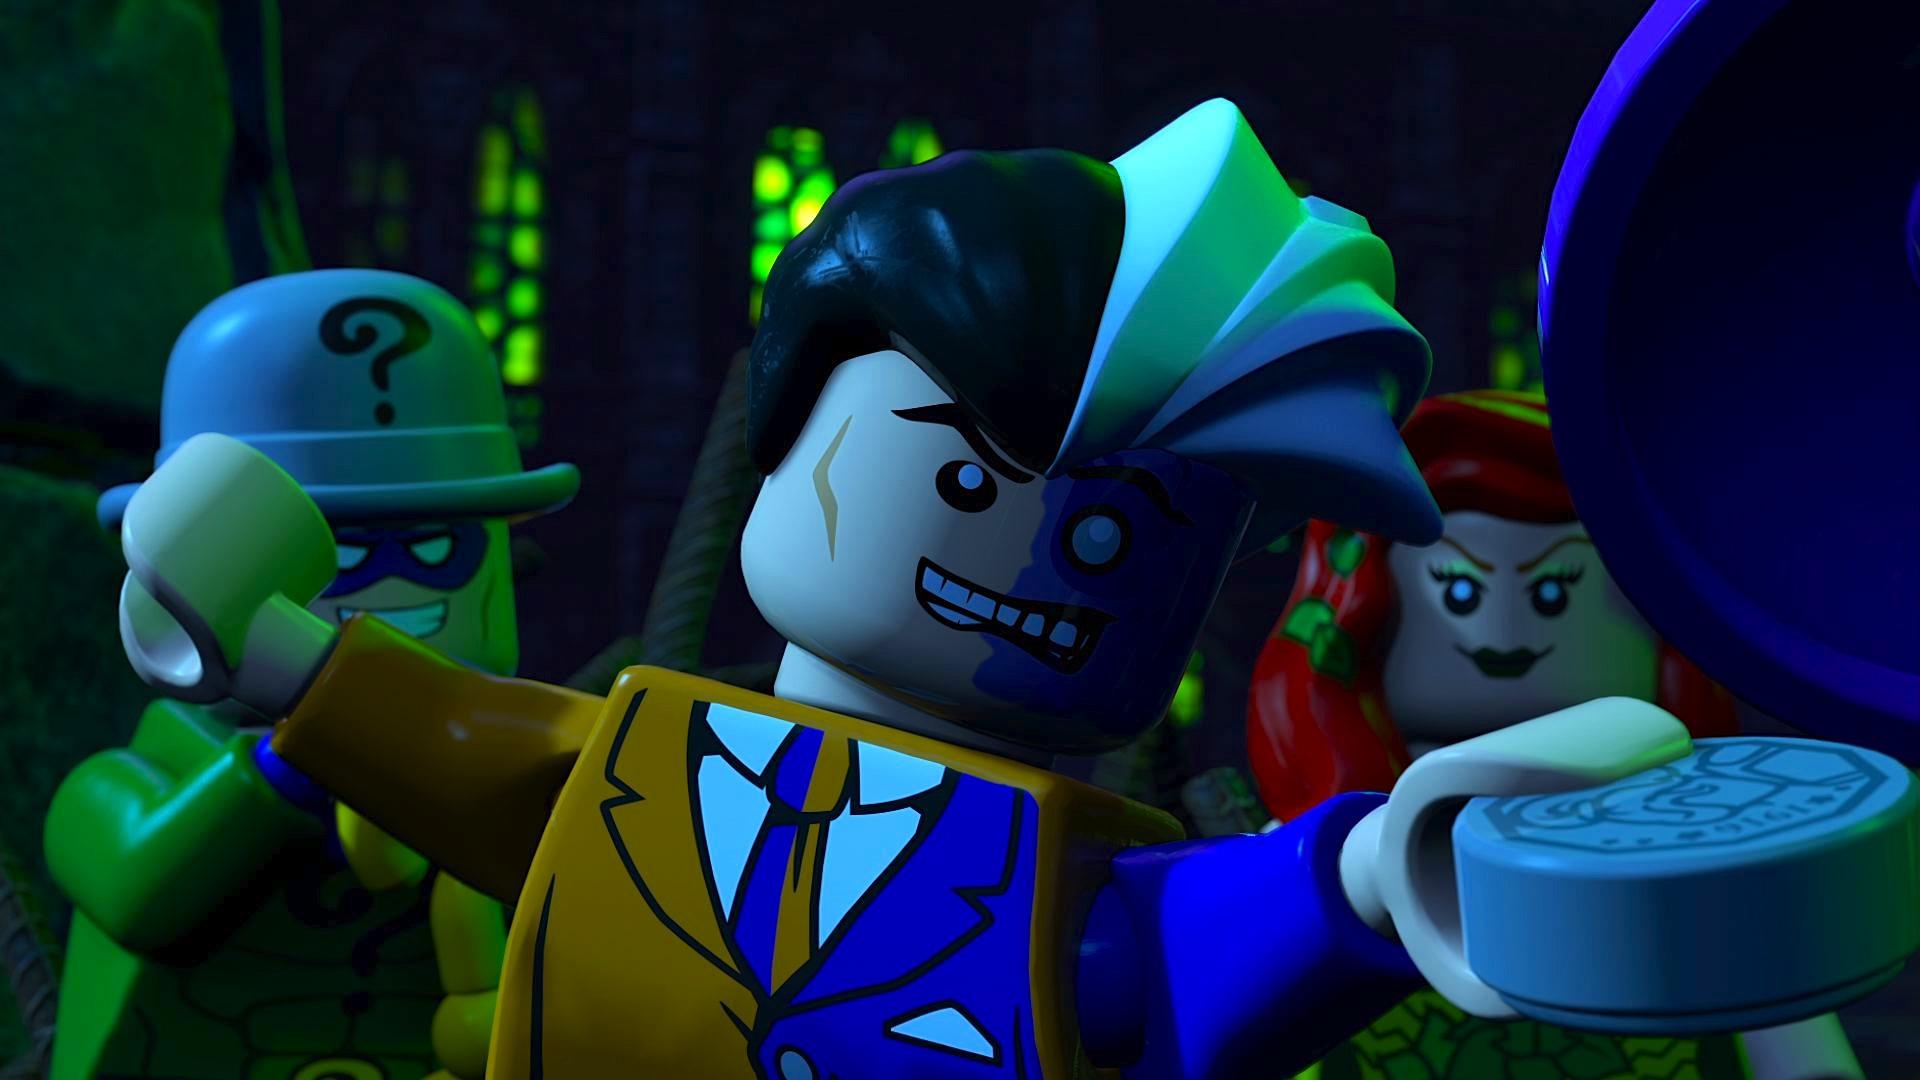 Lego Movie Wallpaper 33382 1920x1080px